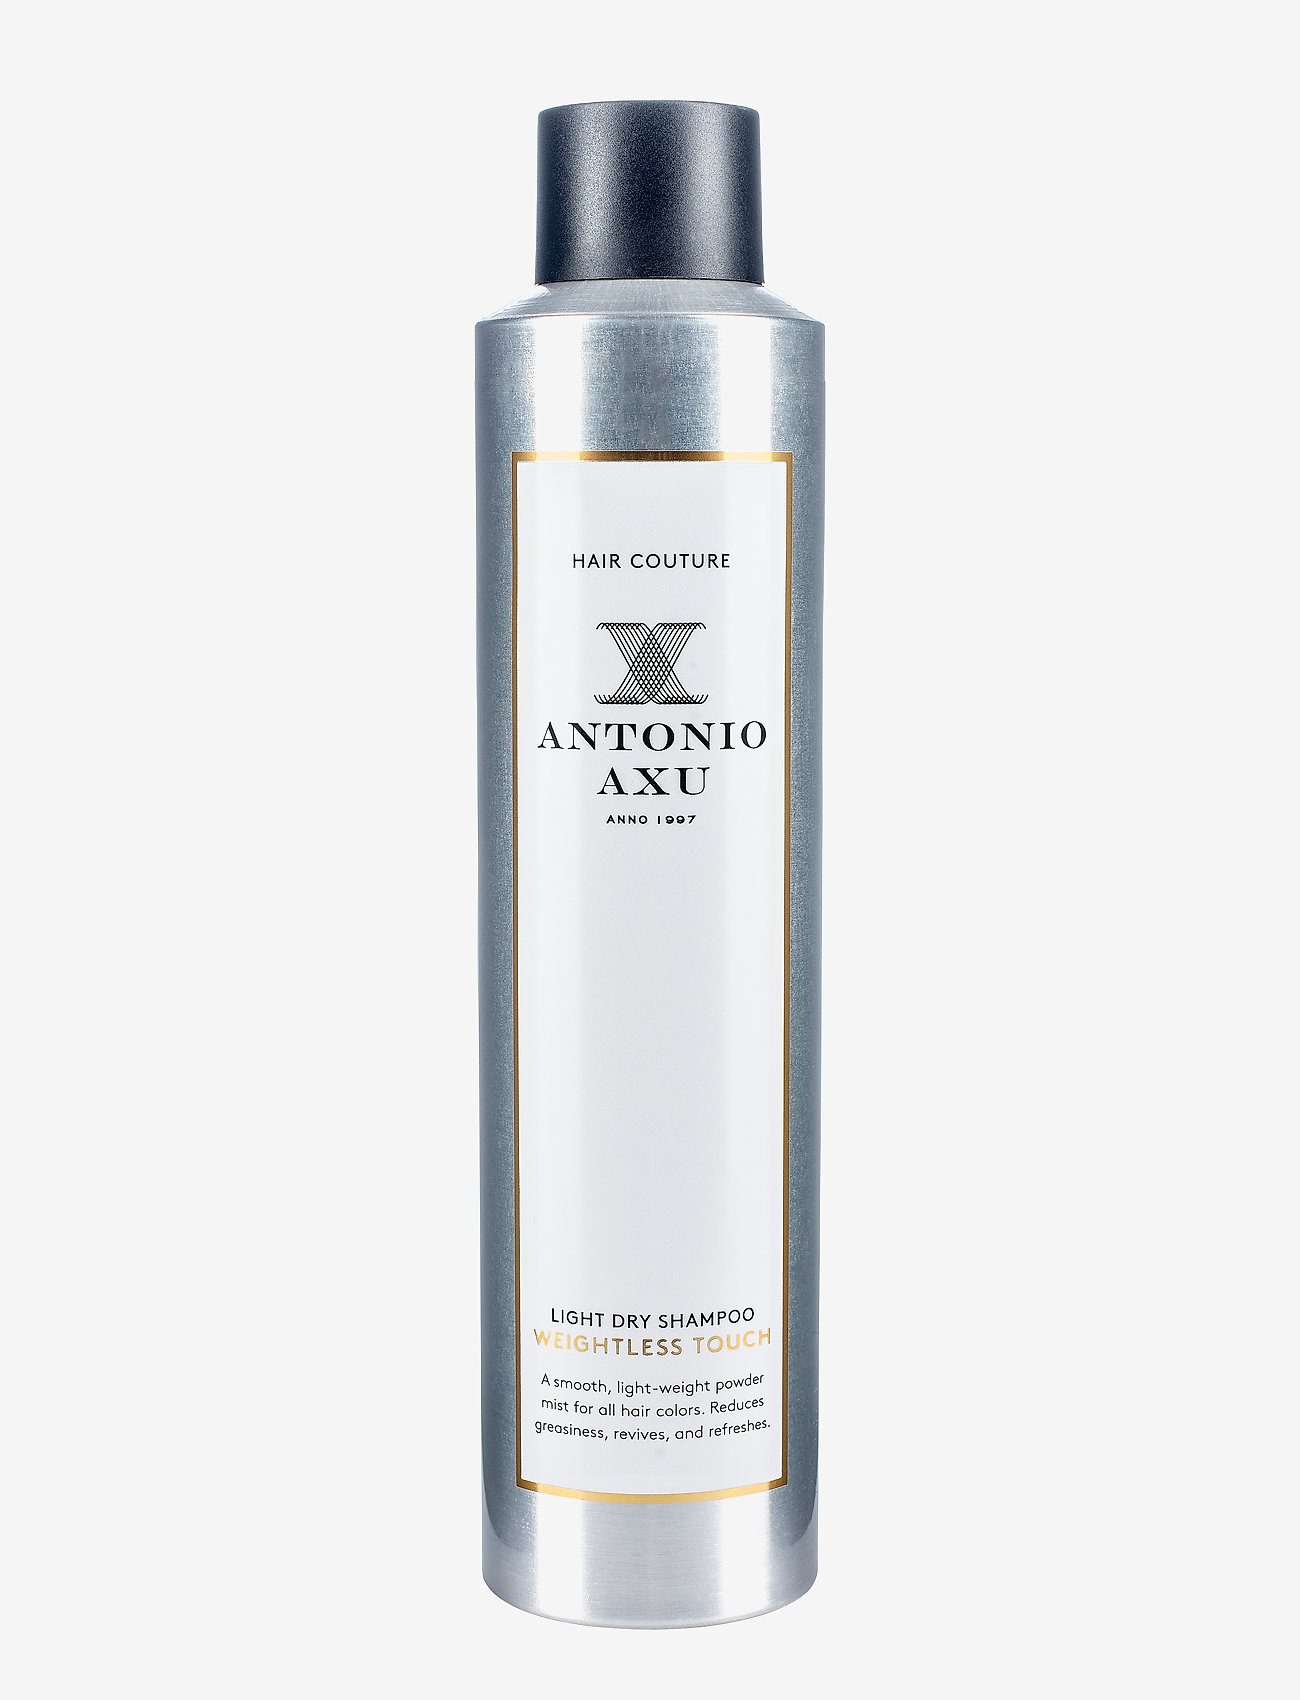 Antonio Axu - LIGHT DRY SHAMPOO WEIGHTLESS TOUCH - tørshampoo - clear - 1